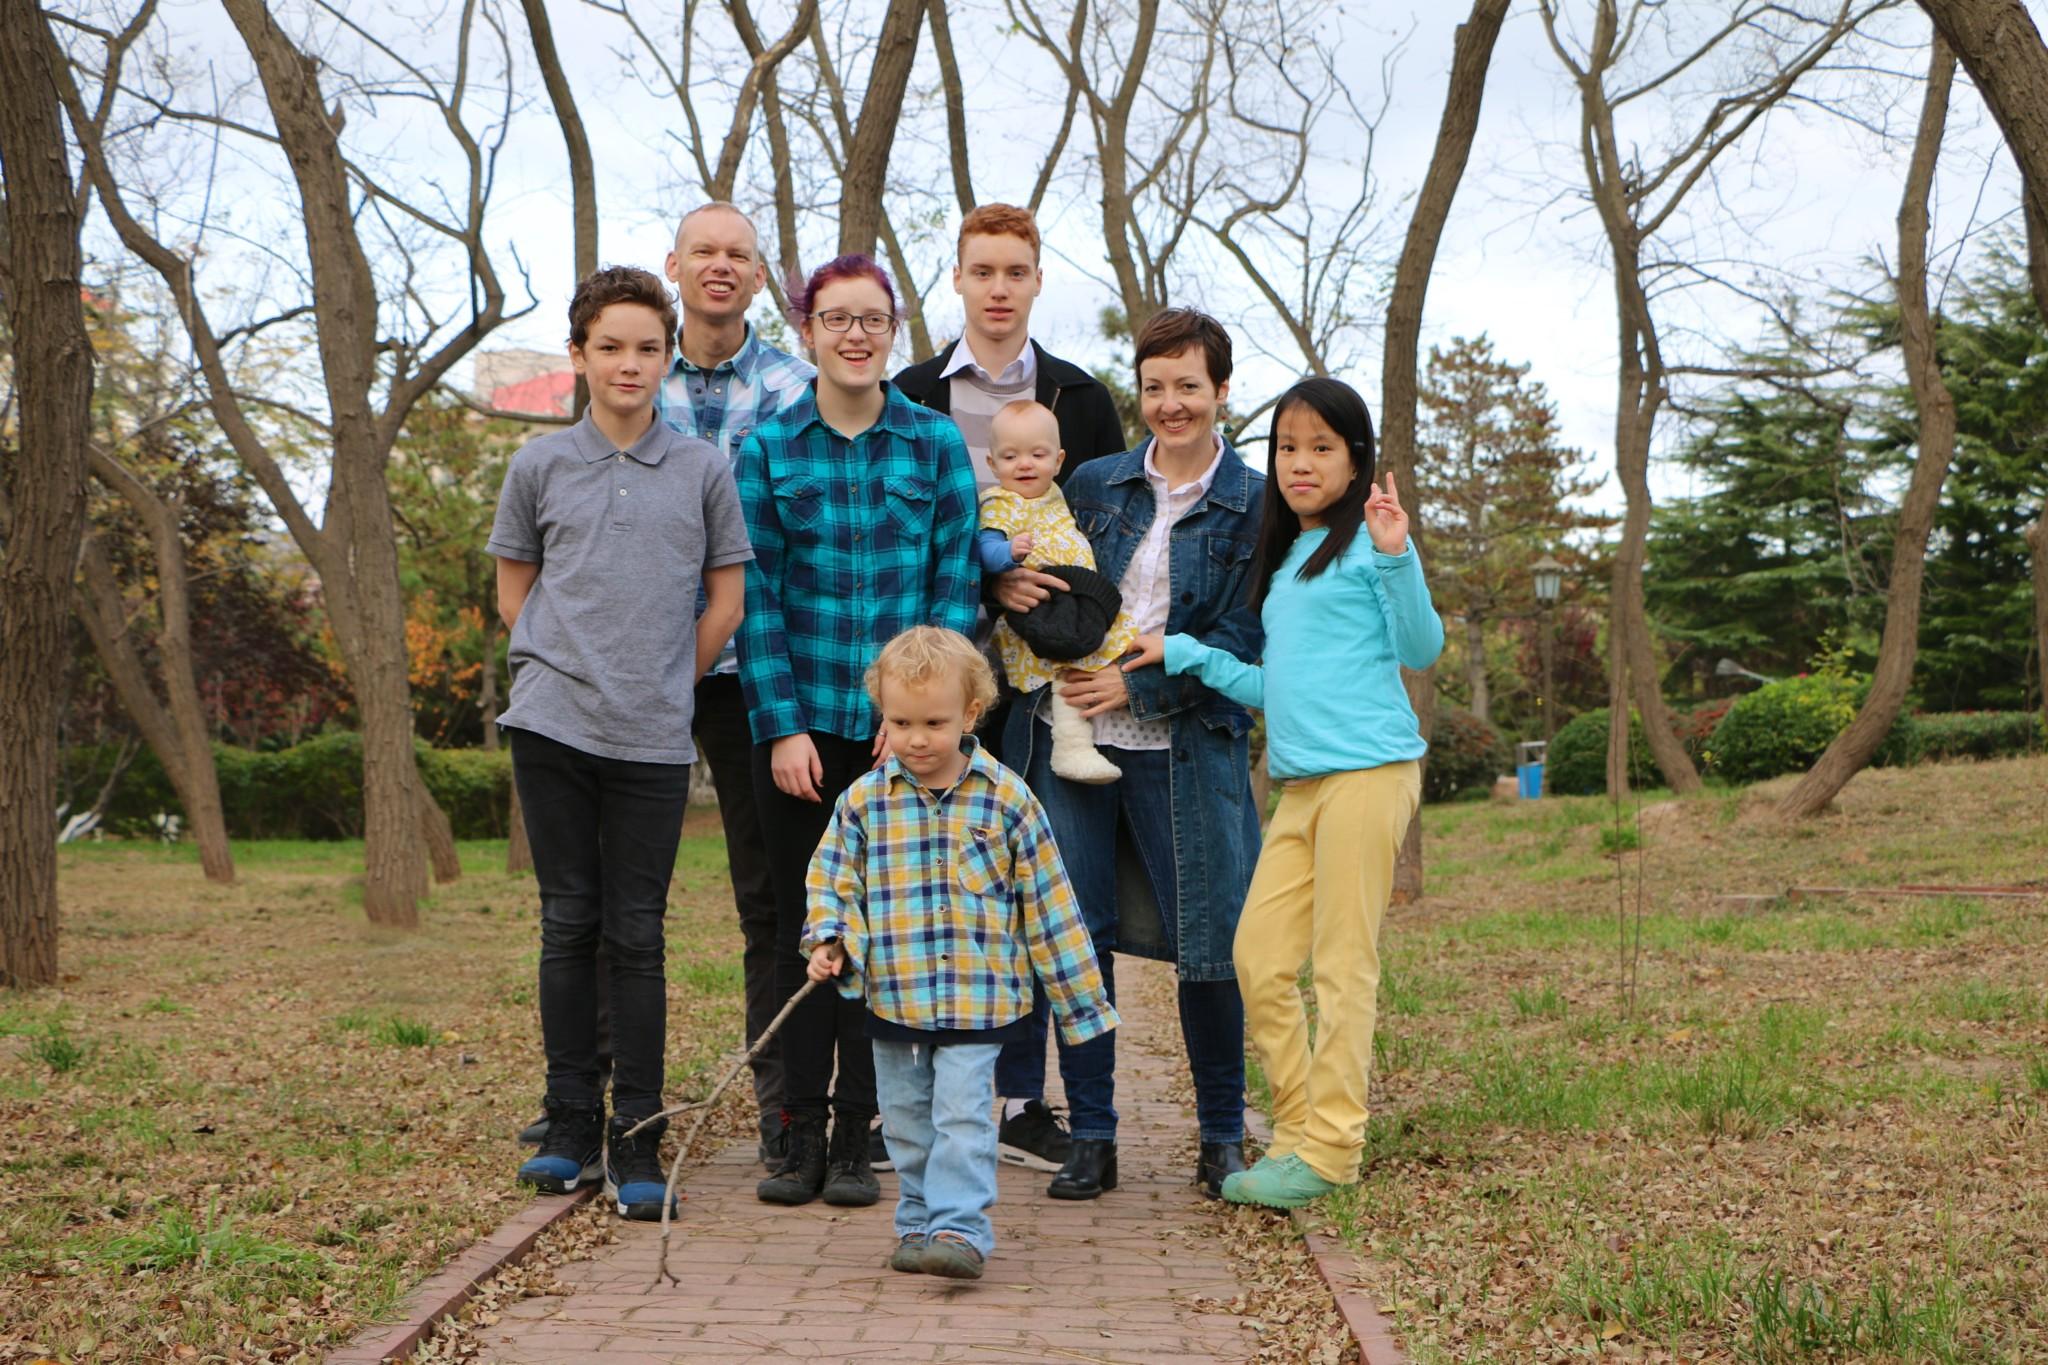 Stern Family Shoot│Sneak Peak